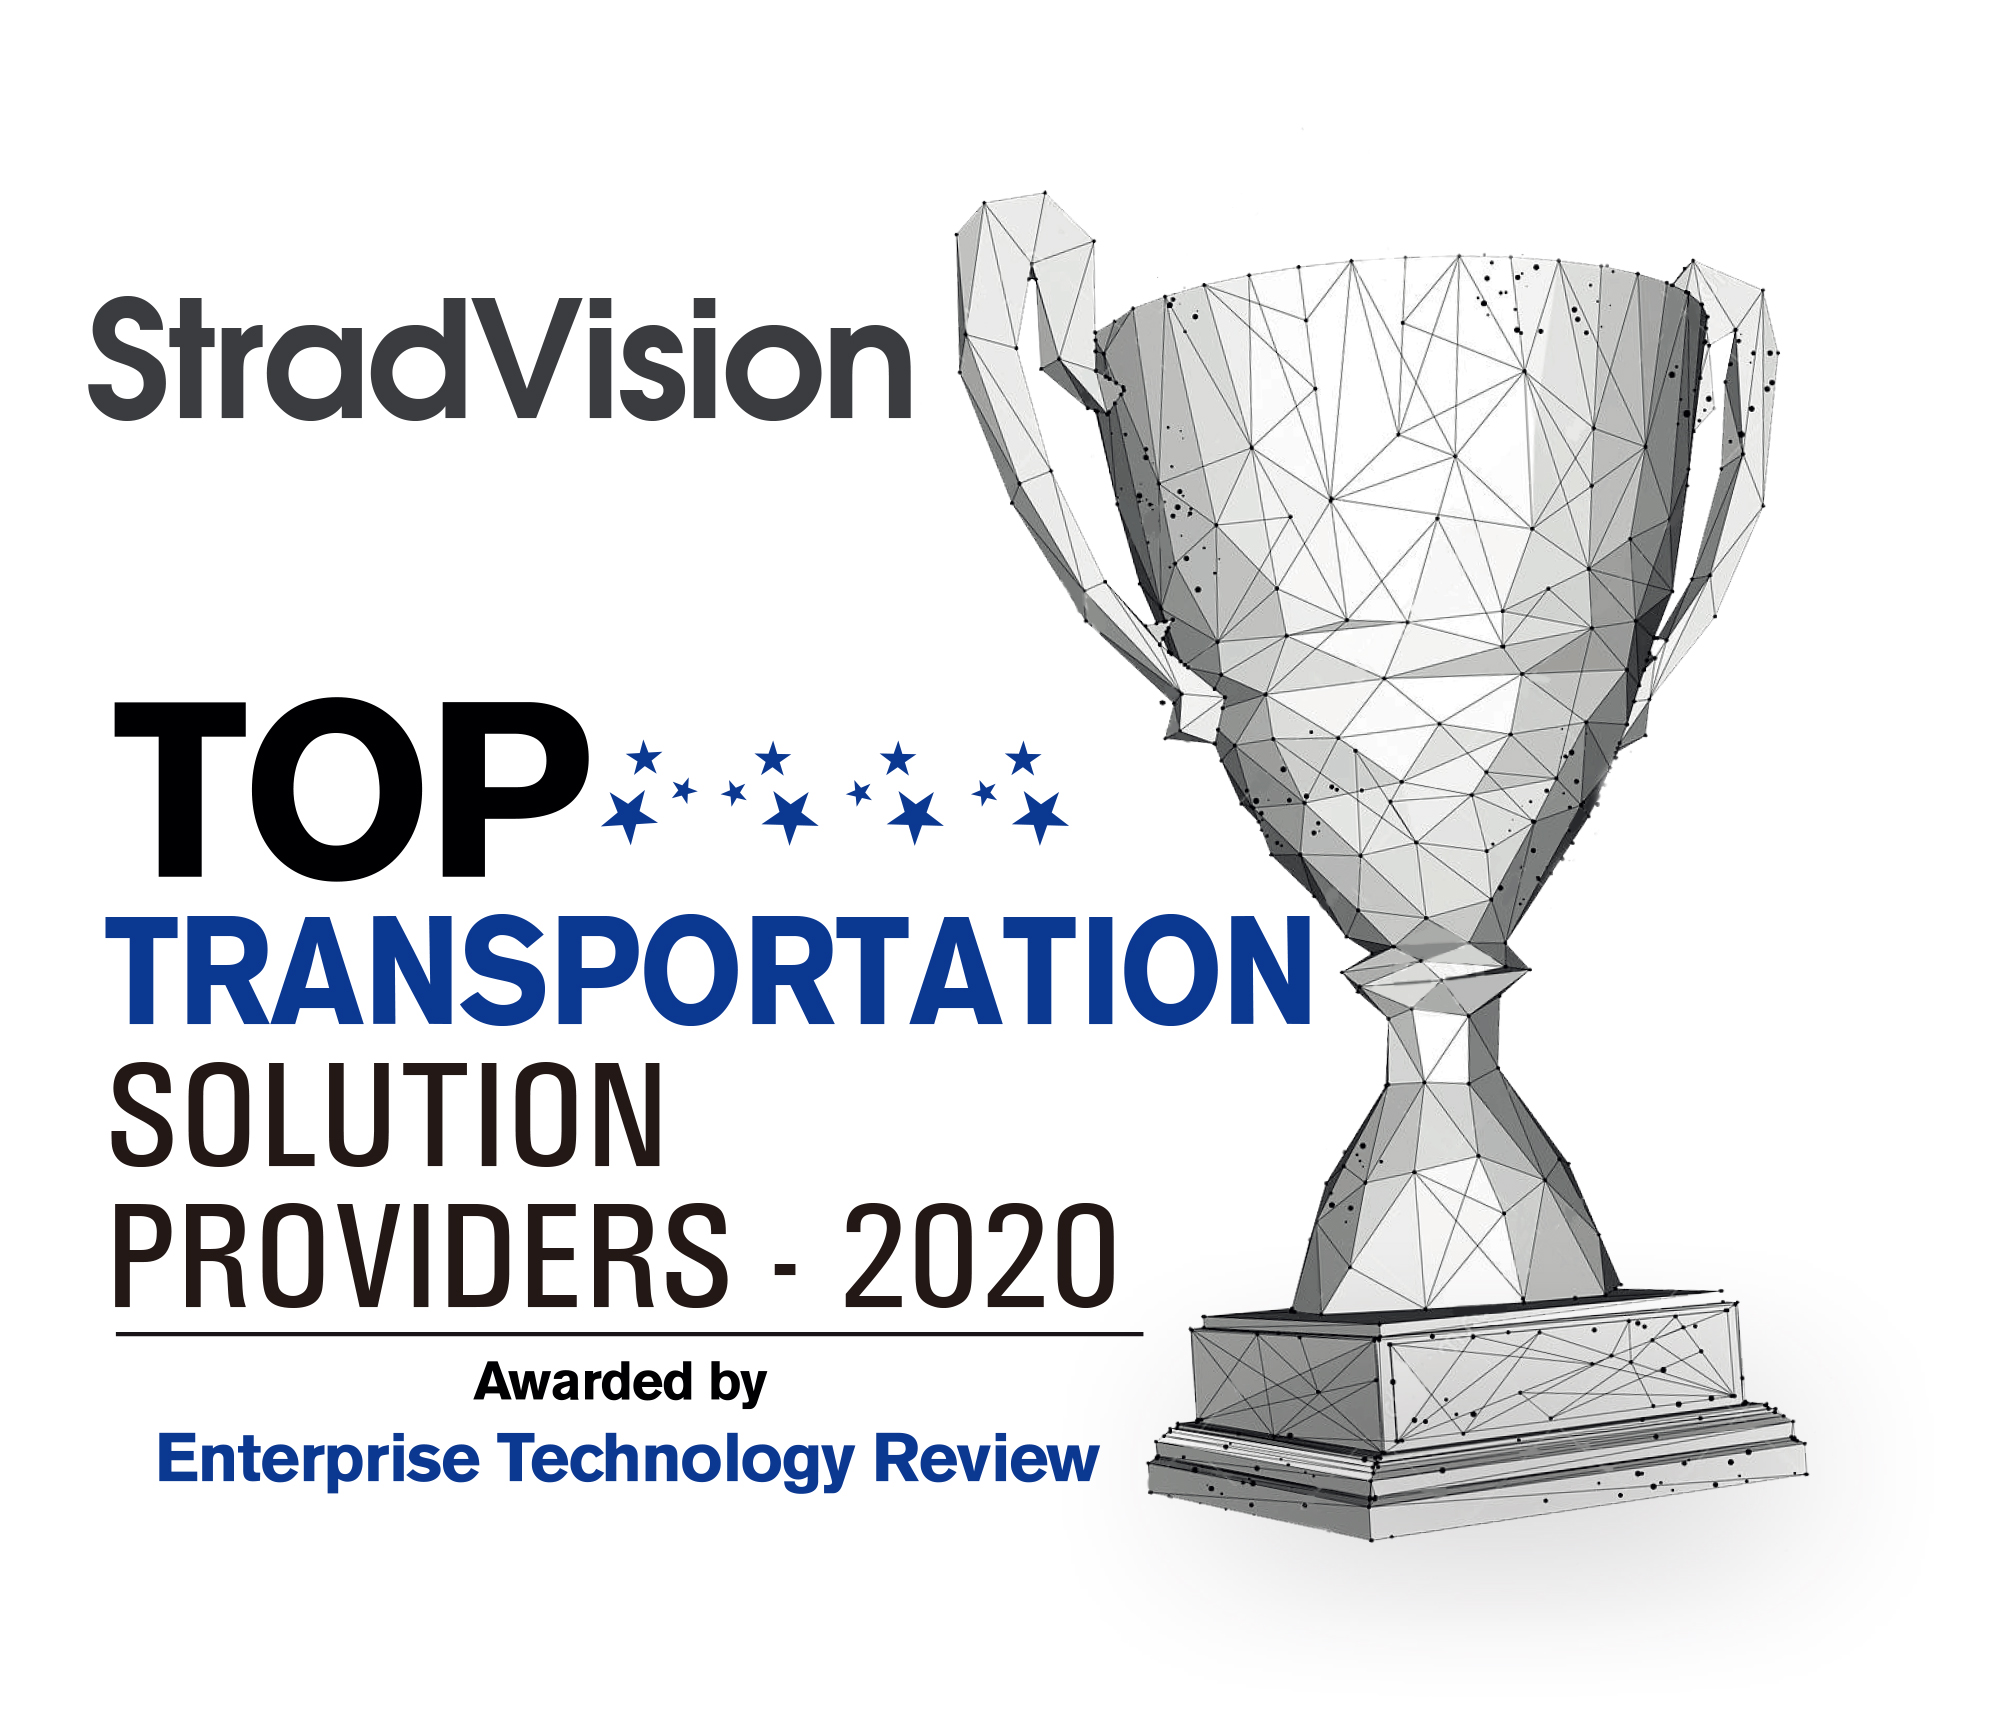 StradVision Award